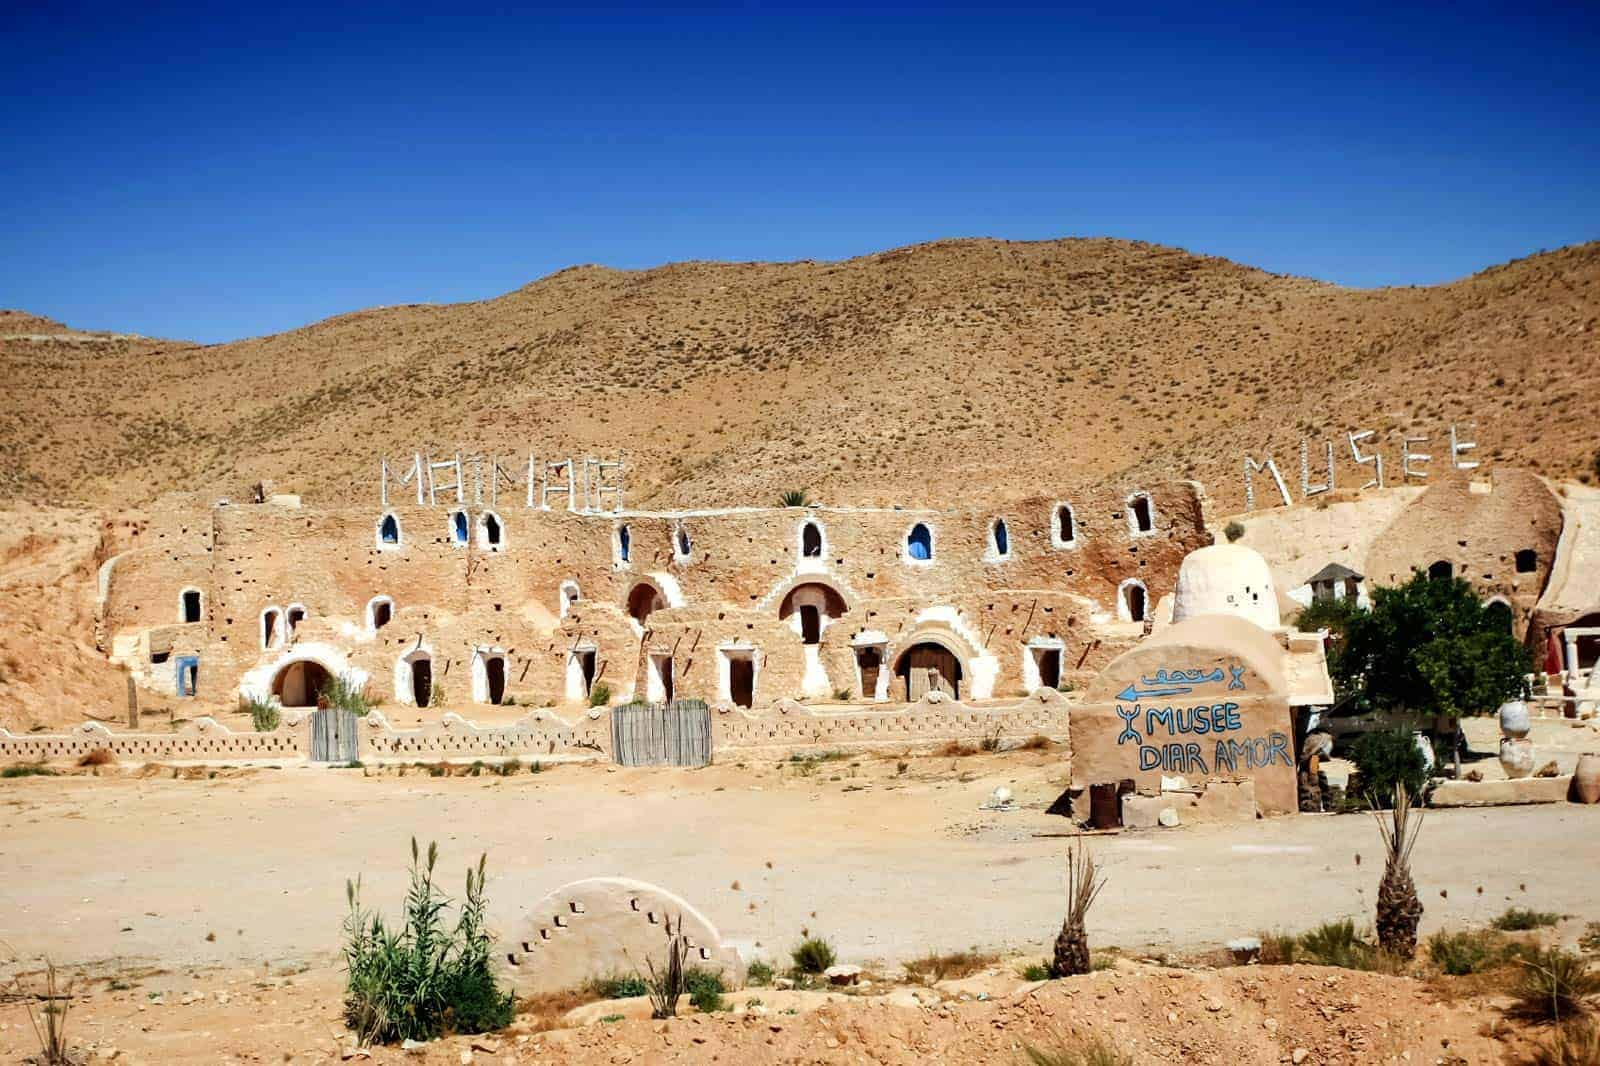 Aldeia troglodita de Matmata, Tunísia